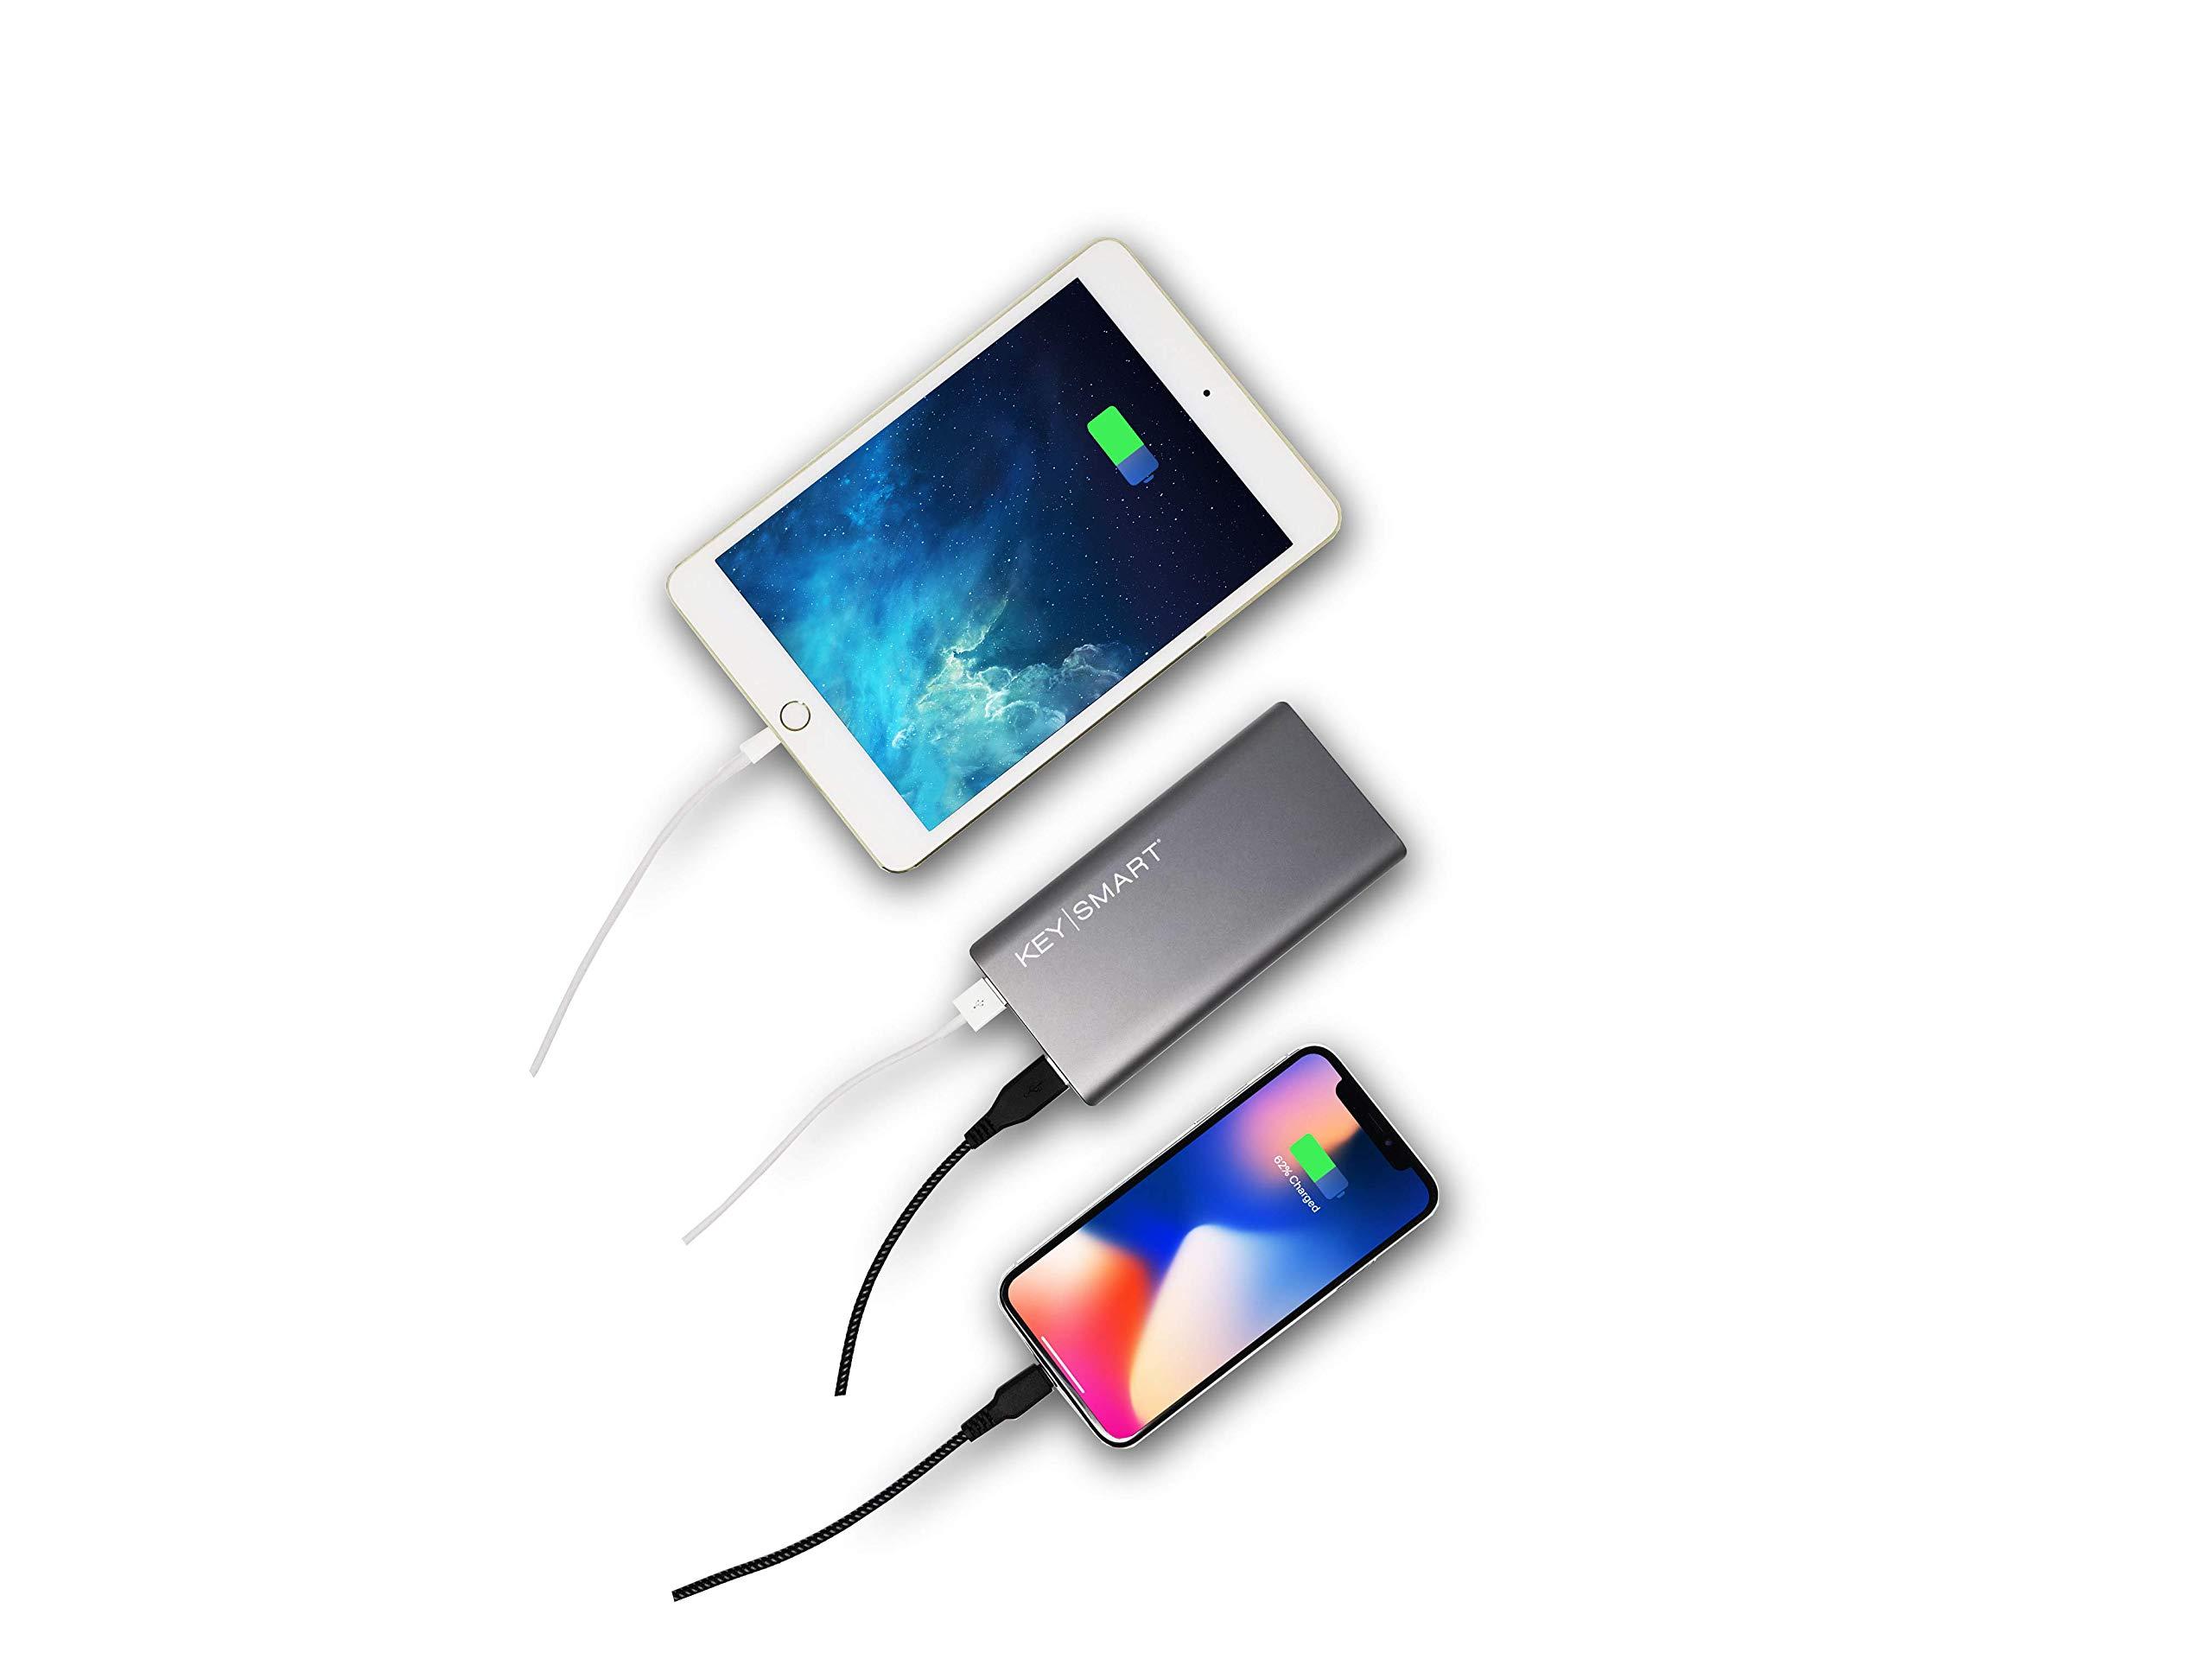 KeySmart USB Powerbank, Portable Charger by KeySmart